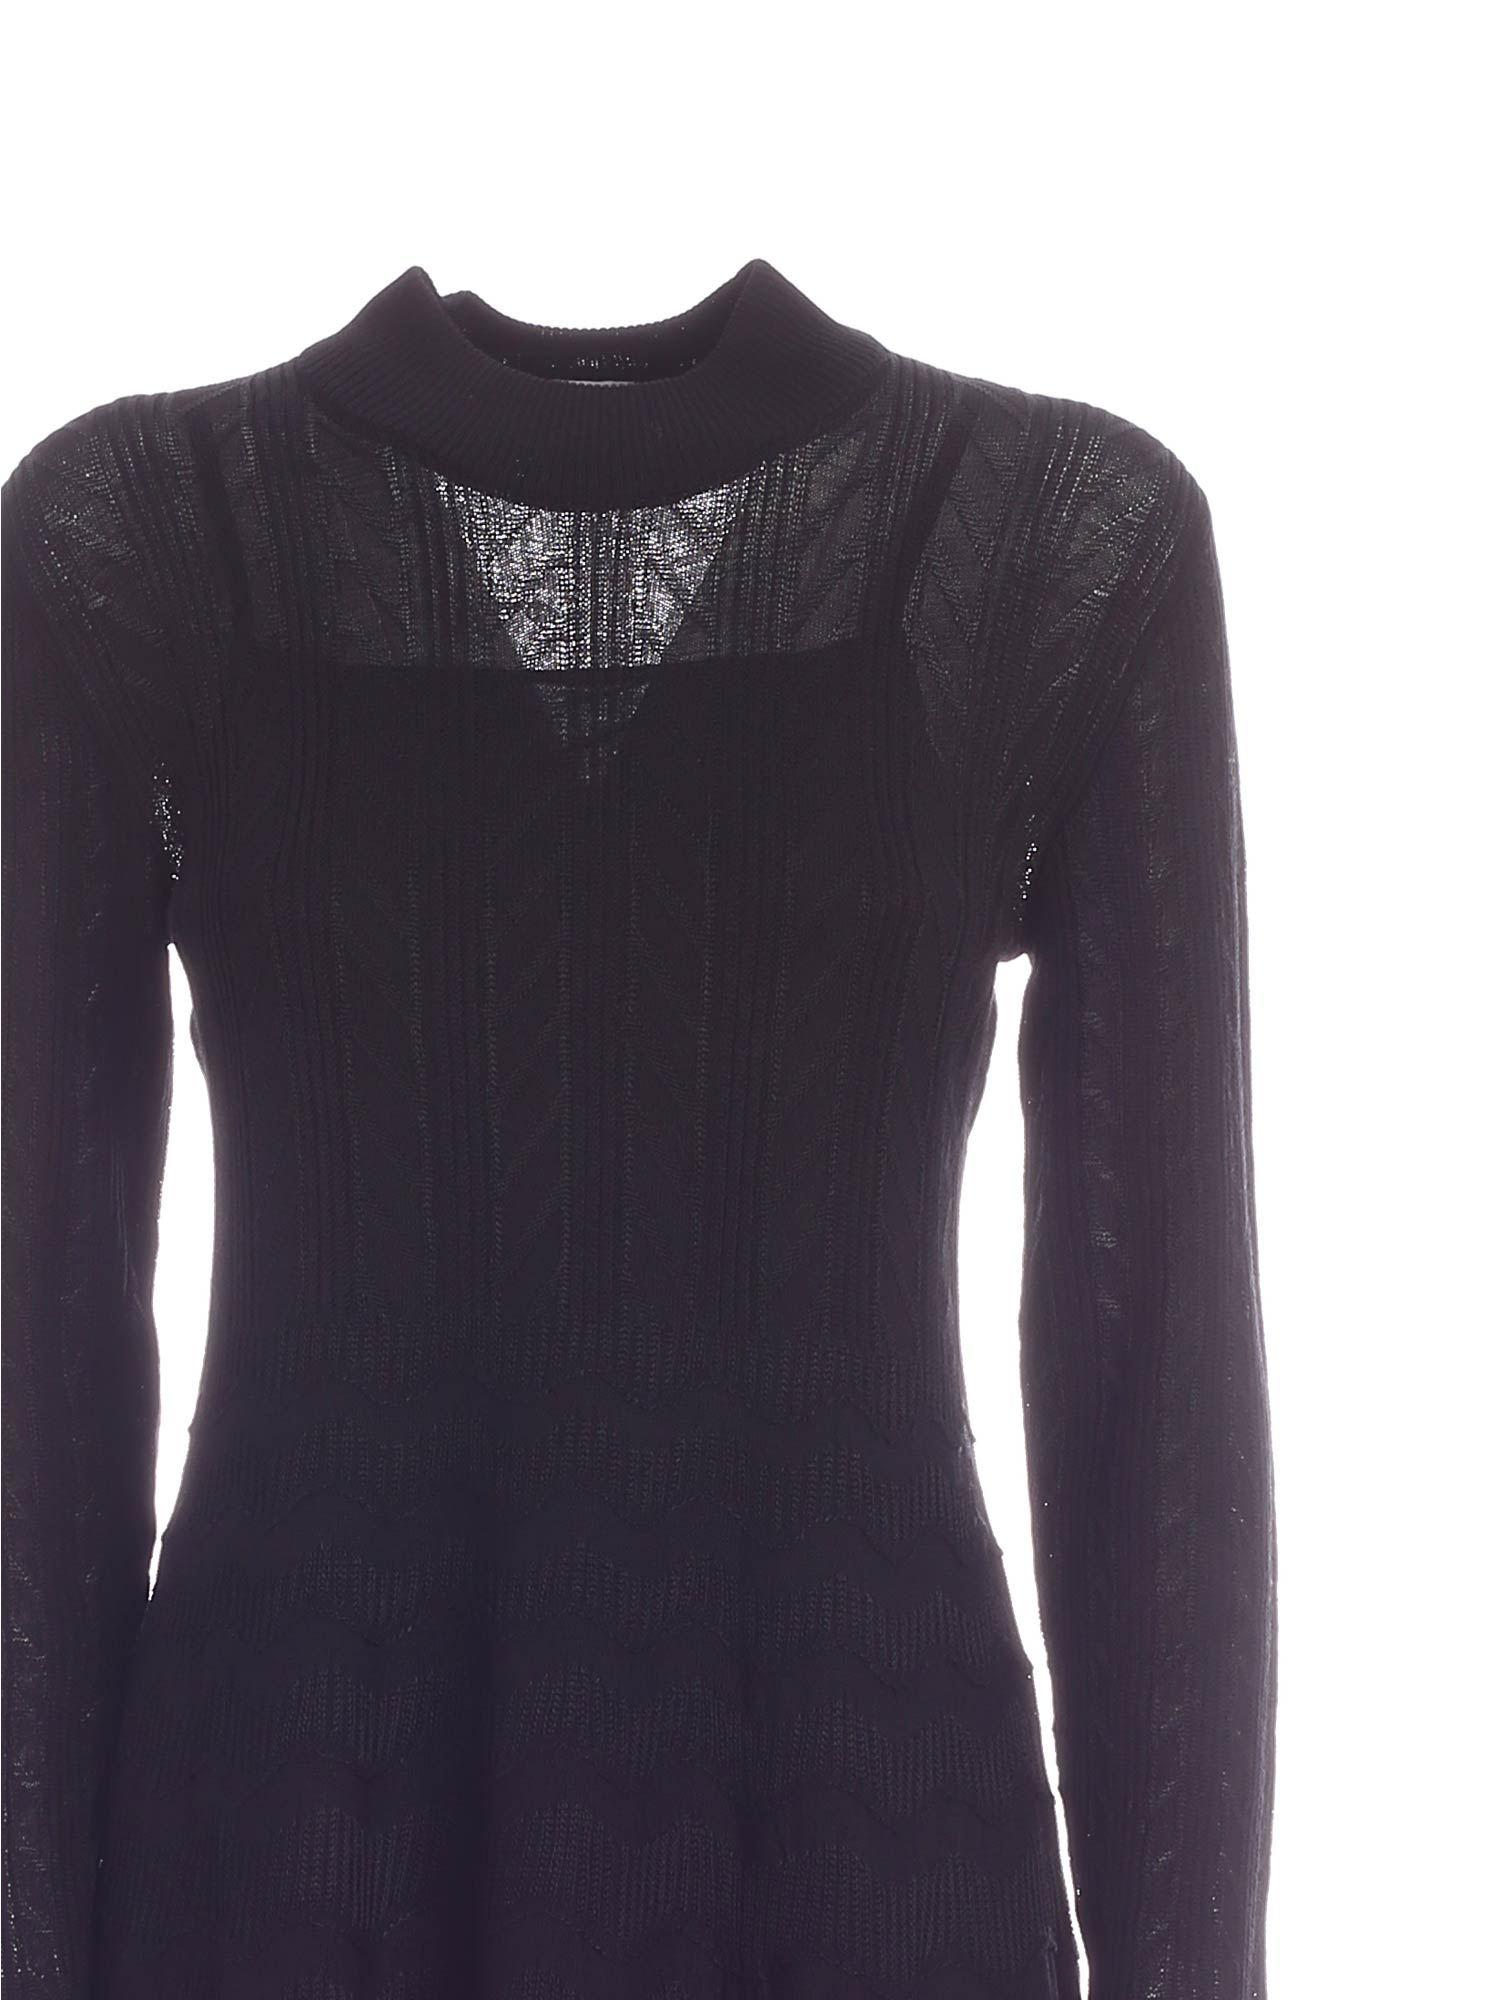 SEMITRANSPARENT DRESS IN BLACK M MISSONI | 11 | 2DG004952K007893911